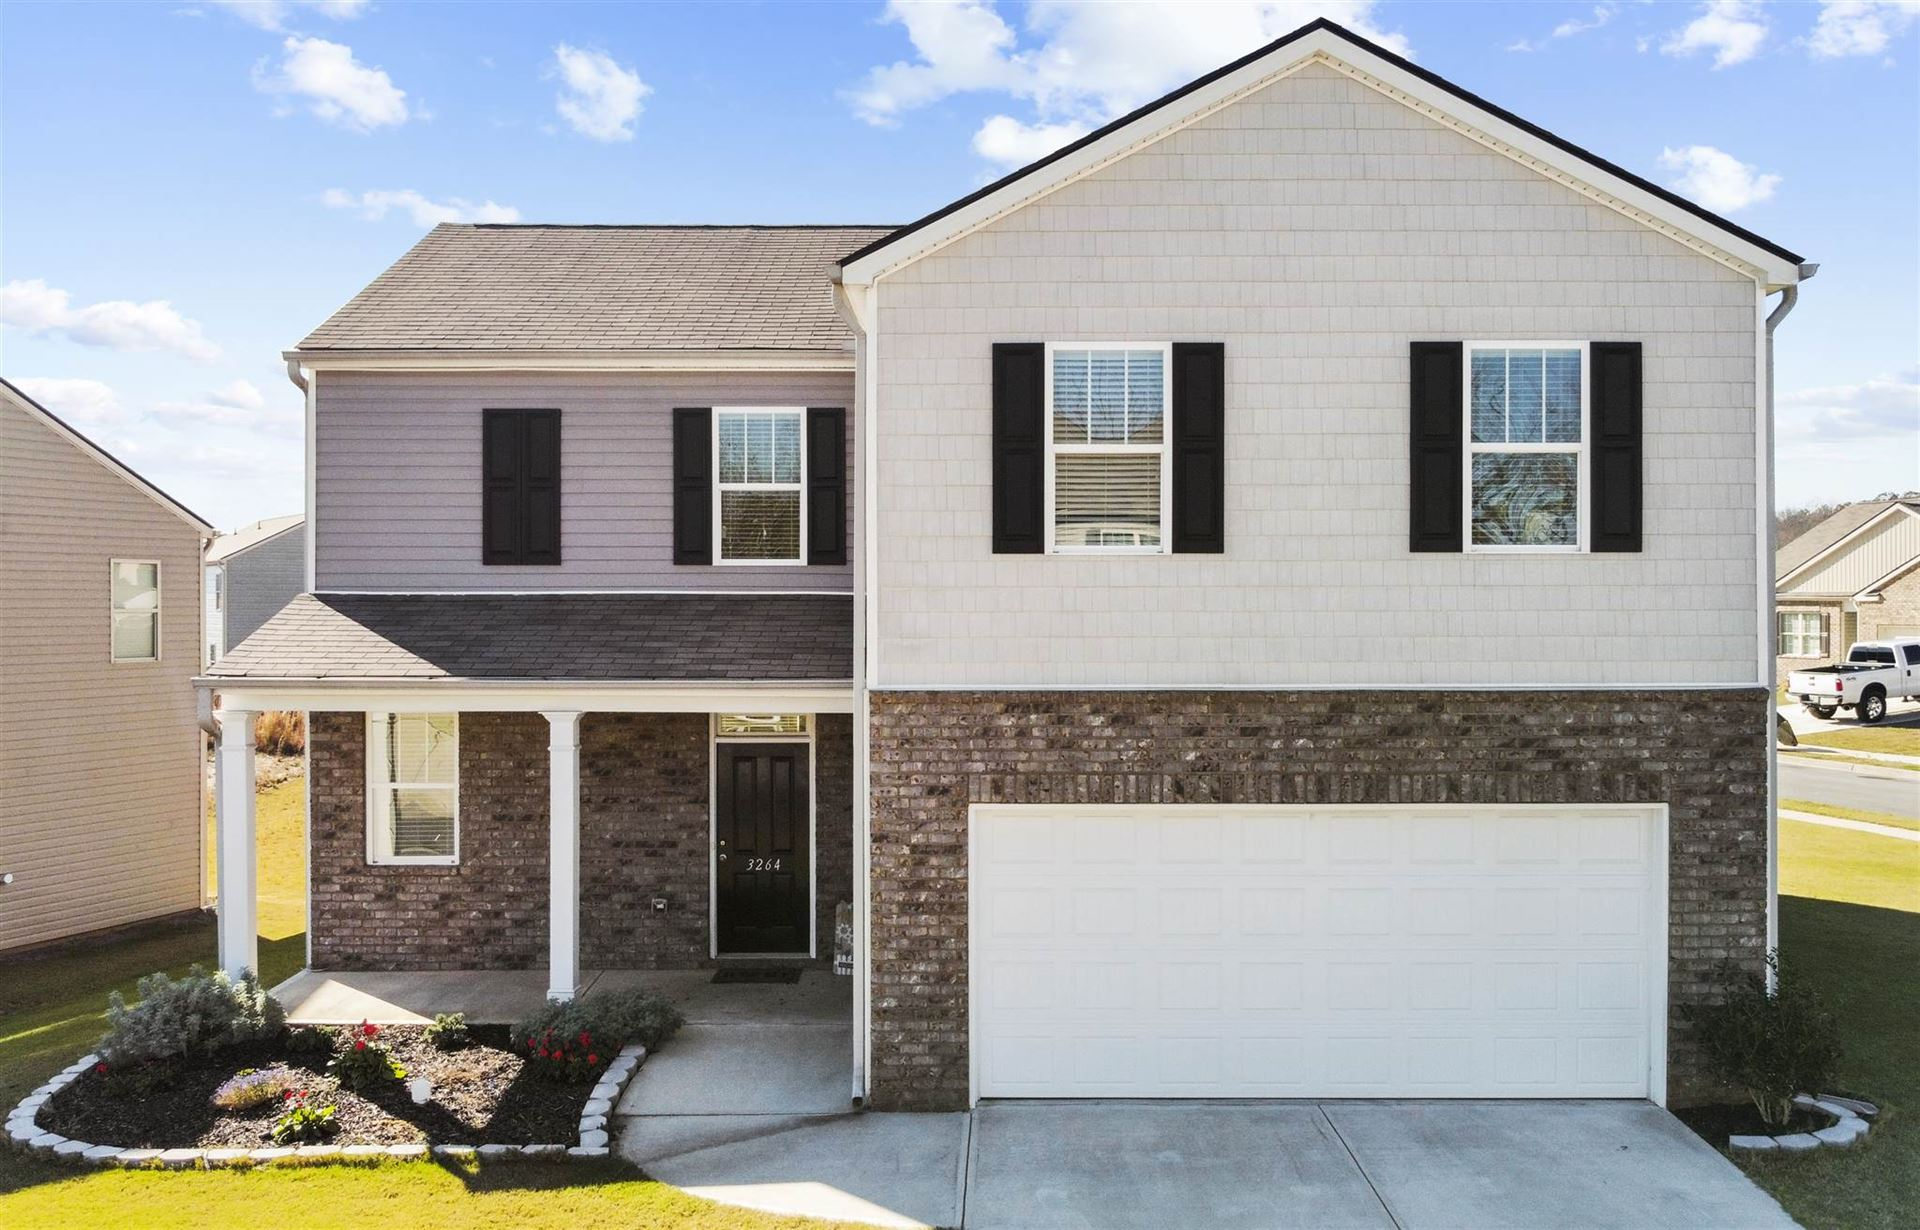 3263 HEATHERWOOD Dr, Gainesville, GA 30507 - MLS#: 8894086